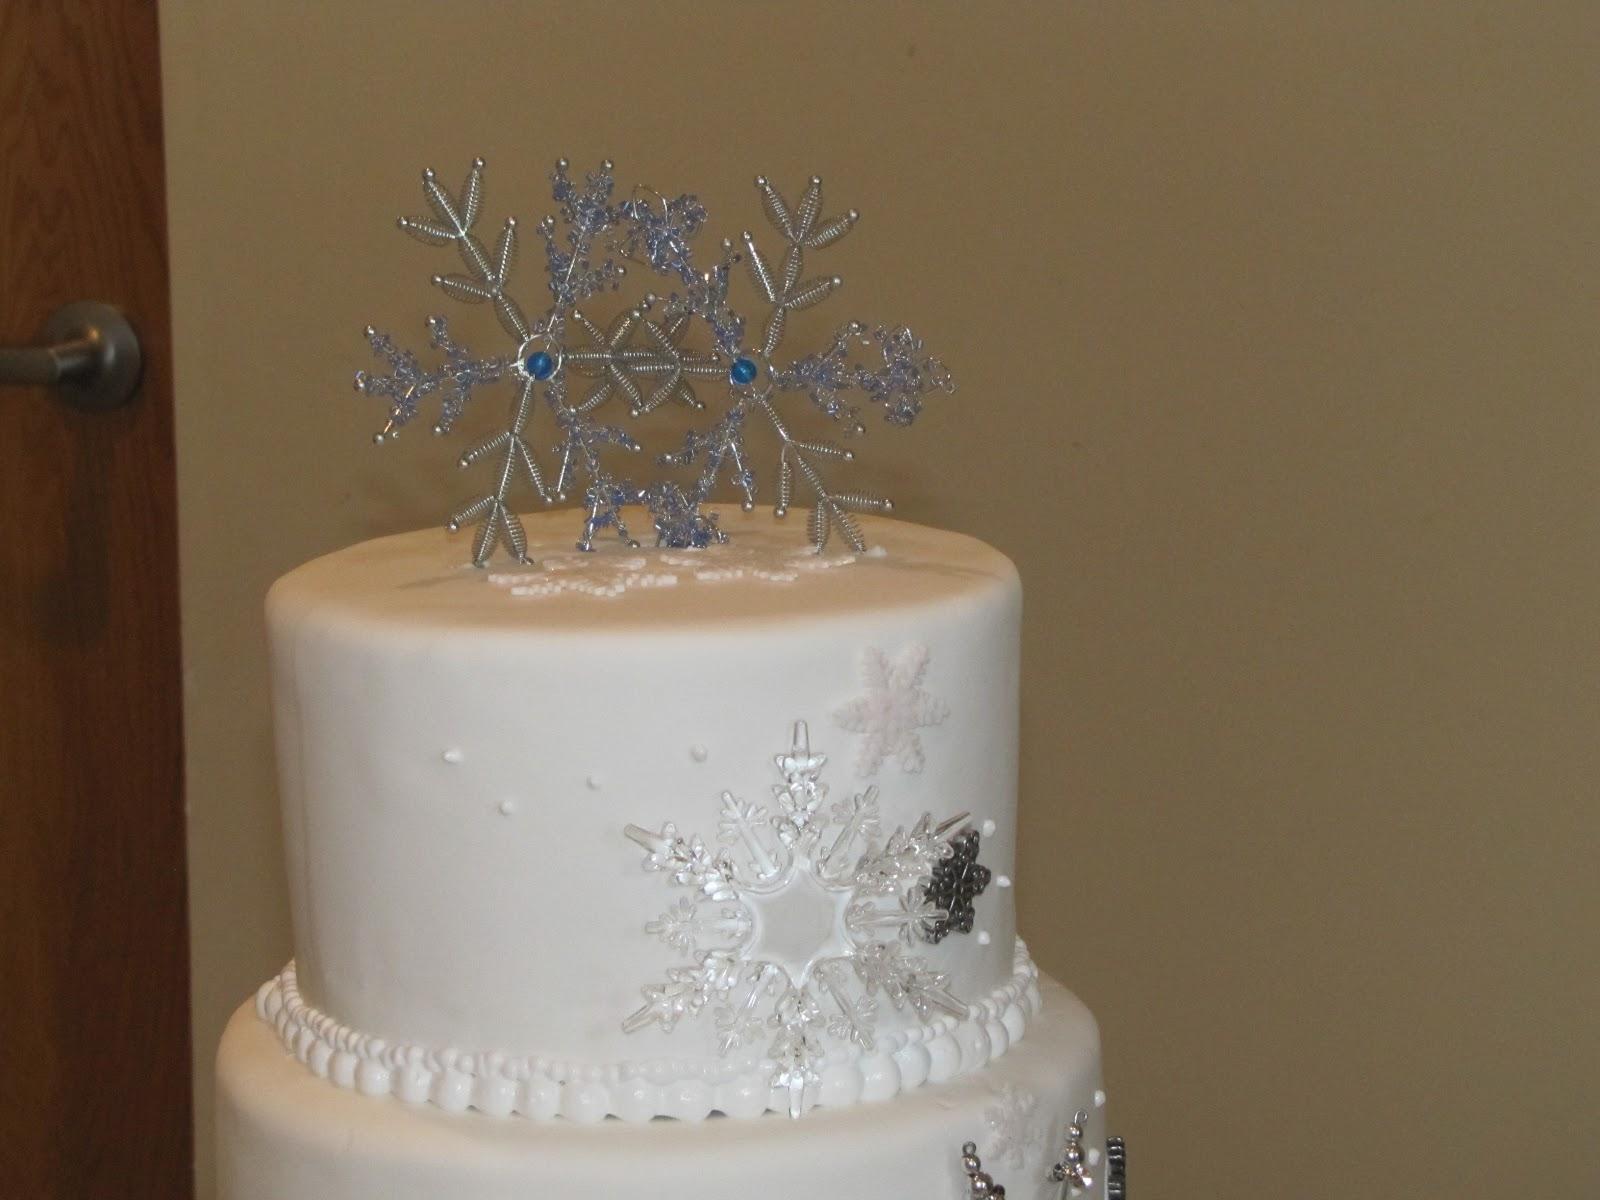 TJ Happy Cakes: Snowflake Wedding Cake